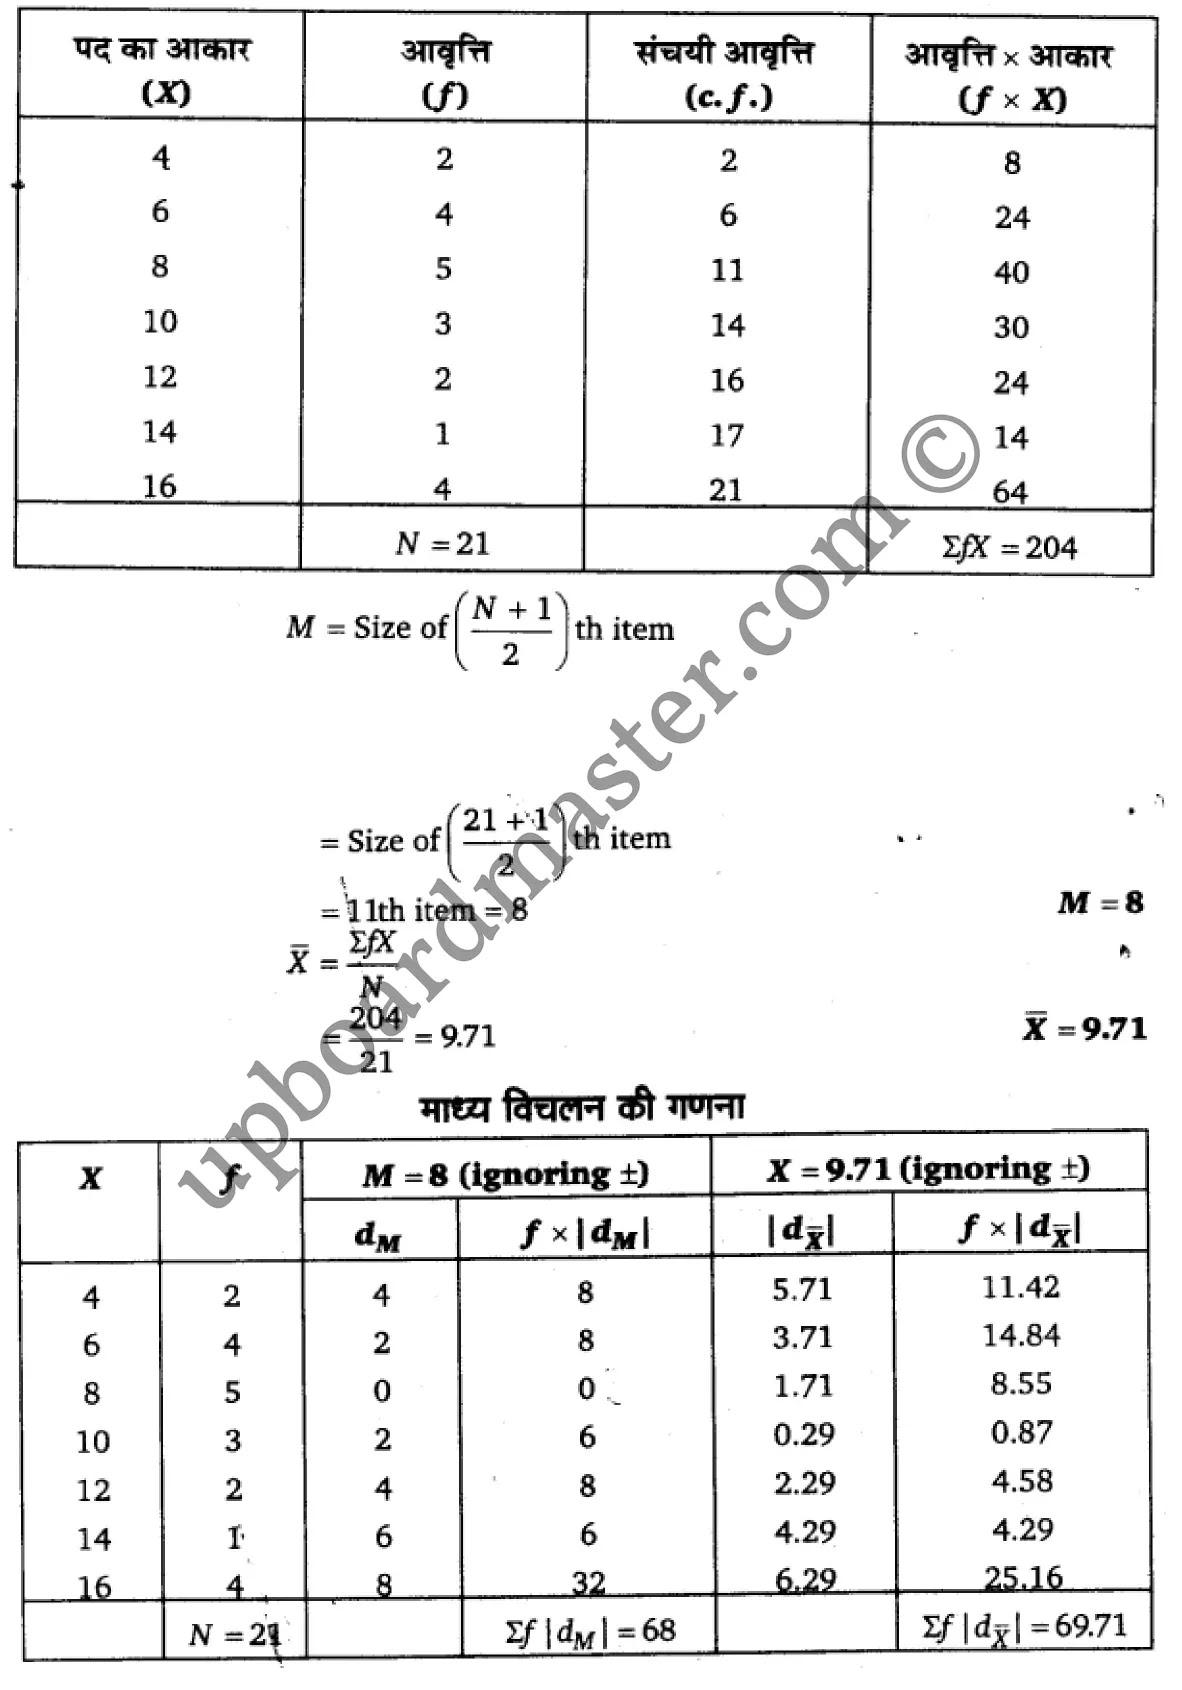 कक्षा 11 अर्थशास्त्र  सांख्यिकी अध्याय 6  के नोट्स  हिंदी में एनसीईआरटी समाधान,     class 11 Economics chapter 6,   class 11 Economics chapter 6 ncert solutions in Economics,  class 11 Economics chapter 6 notes in hindi,   class 11 Economics chapter 6 question answer,   class 11 Economics chapter 6 notes,   class 11 Economics chapter 6 class 11 Economics  chapter 6 in  hindi,    class 11 Economics chapter 6 important questions in  hindi,   class 11 Economics hindi  chapter 6 notes in hindi,   class 11 Economics  chapter 6 test,   class 11 Economics  chapter 6 class 11 Economics  chapter 6 pdf,   class 11 Economics  chapter 6 notes pdf,   class 11 Economics  chapter 6 exercise solutions,  class 11 Economics  chapter 6,  class 11 Economics  chapter 6 notes study rankers,  class 11 Economics  chapter 6 notes,   class 11 Economics hindi  chapter 6 notes,    class 11 Economics   chapter 6  class 11  notes pdf,  class 11 Economics  chapter 6 class 11  notes  ncert,  class 11 Economics  chapter 6 class 11 pdf,   class 11 Economics  chapter 6  book,   class 11 Economics  chapter 6 quiz class 11  ,    11  th class 11 Economics chapter 6  book up board,   up board 11  th class 11 Economics chapter 6 notes,  class 11 Economics  Statistics for Economics chapter 6,   class 11 Economics  Statistics for Economics chapter 6 ncert solutions in Economics,   class 11 Economics  Statistics for Economics chapter 6 notes in hindi,   class 11 Economics  Statistics for Economics chapter 6 question answer,   class 11 Economics  Statistics for Economics  chapter 6 notes,  class 11 Economics  Statistics for Economics  chapter 6 class 11 Economics  chapter 6 in  hindi,    class 11 Economics  Statistics for Economics chapter 6 important questions in  hindi,   class 11 Economics  Statistics for Economics  chapter 6 notes in hindi,    class 11 Economics  Statistics for Economics  chapter 6 test,  class 11 Economics  Statistics for Economics  chapter 6 class 11 Economics  chapter 6 pdf,   class 11